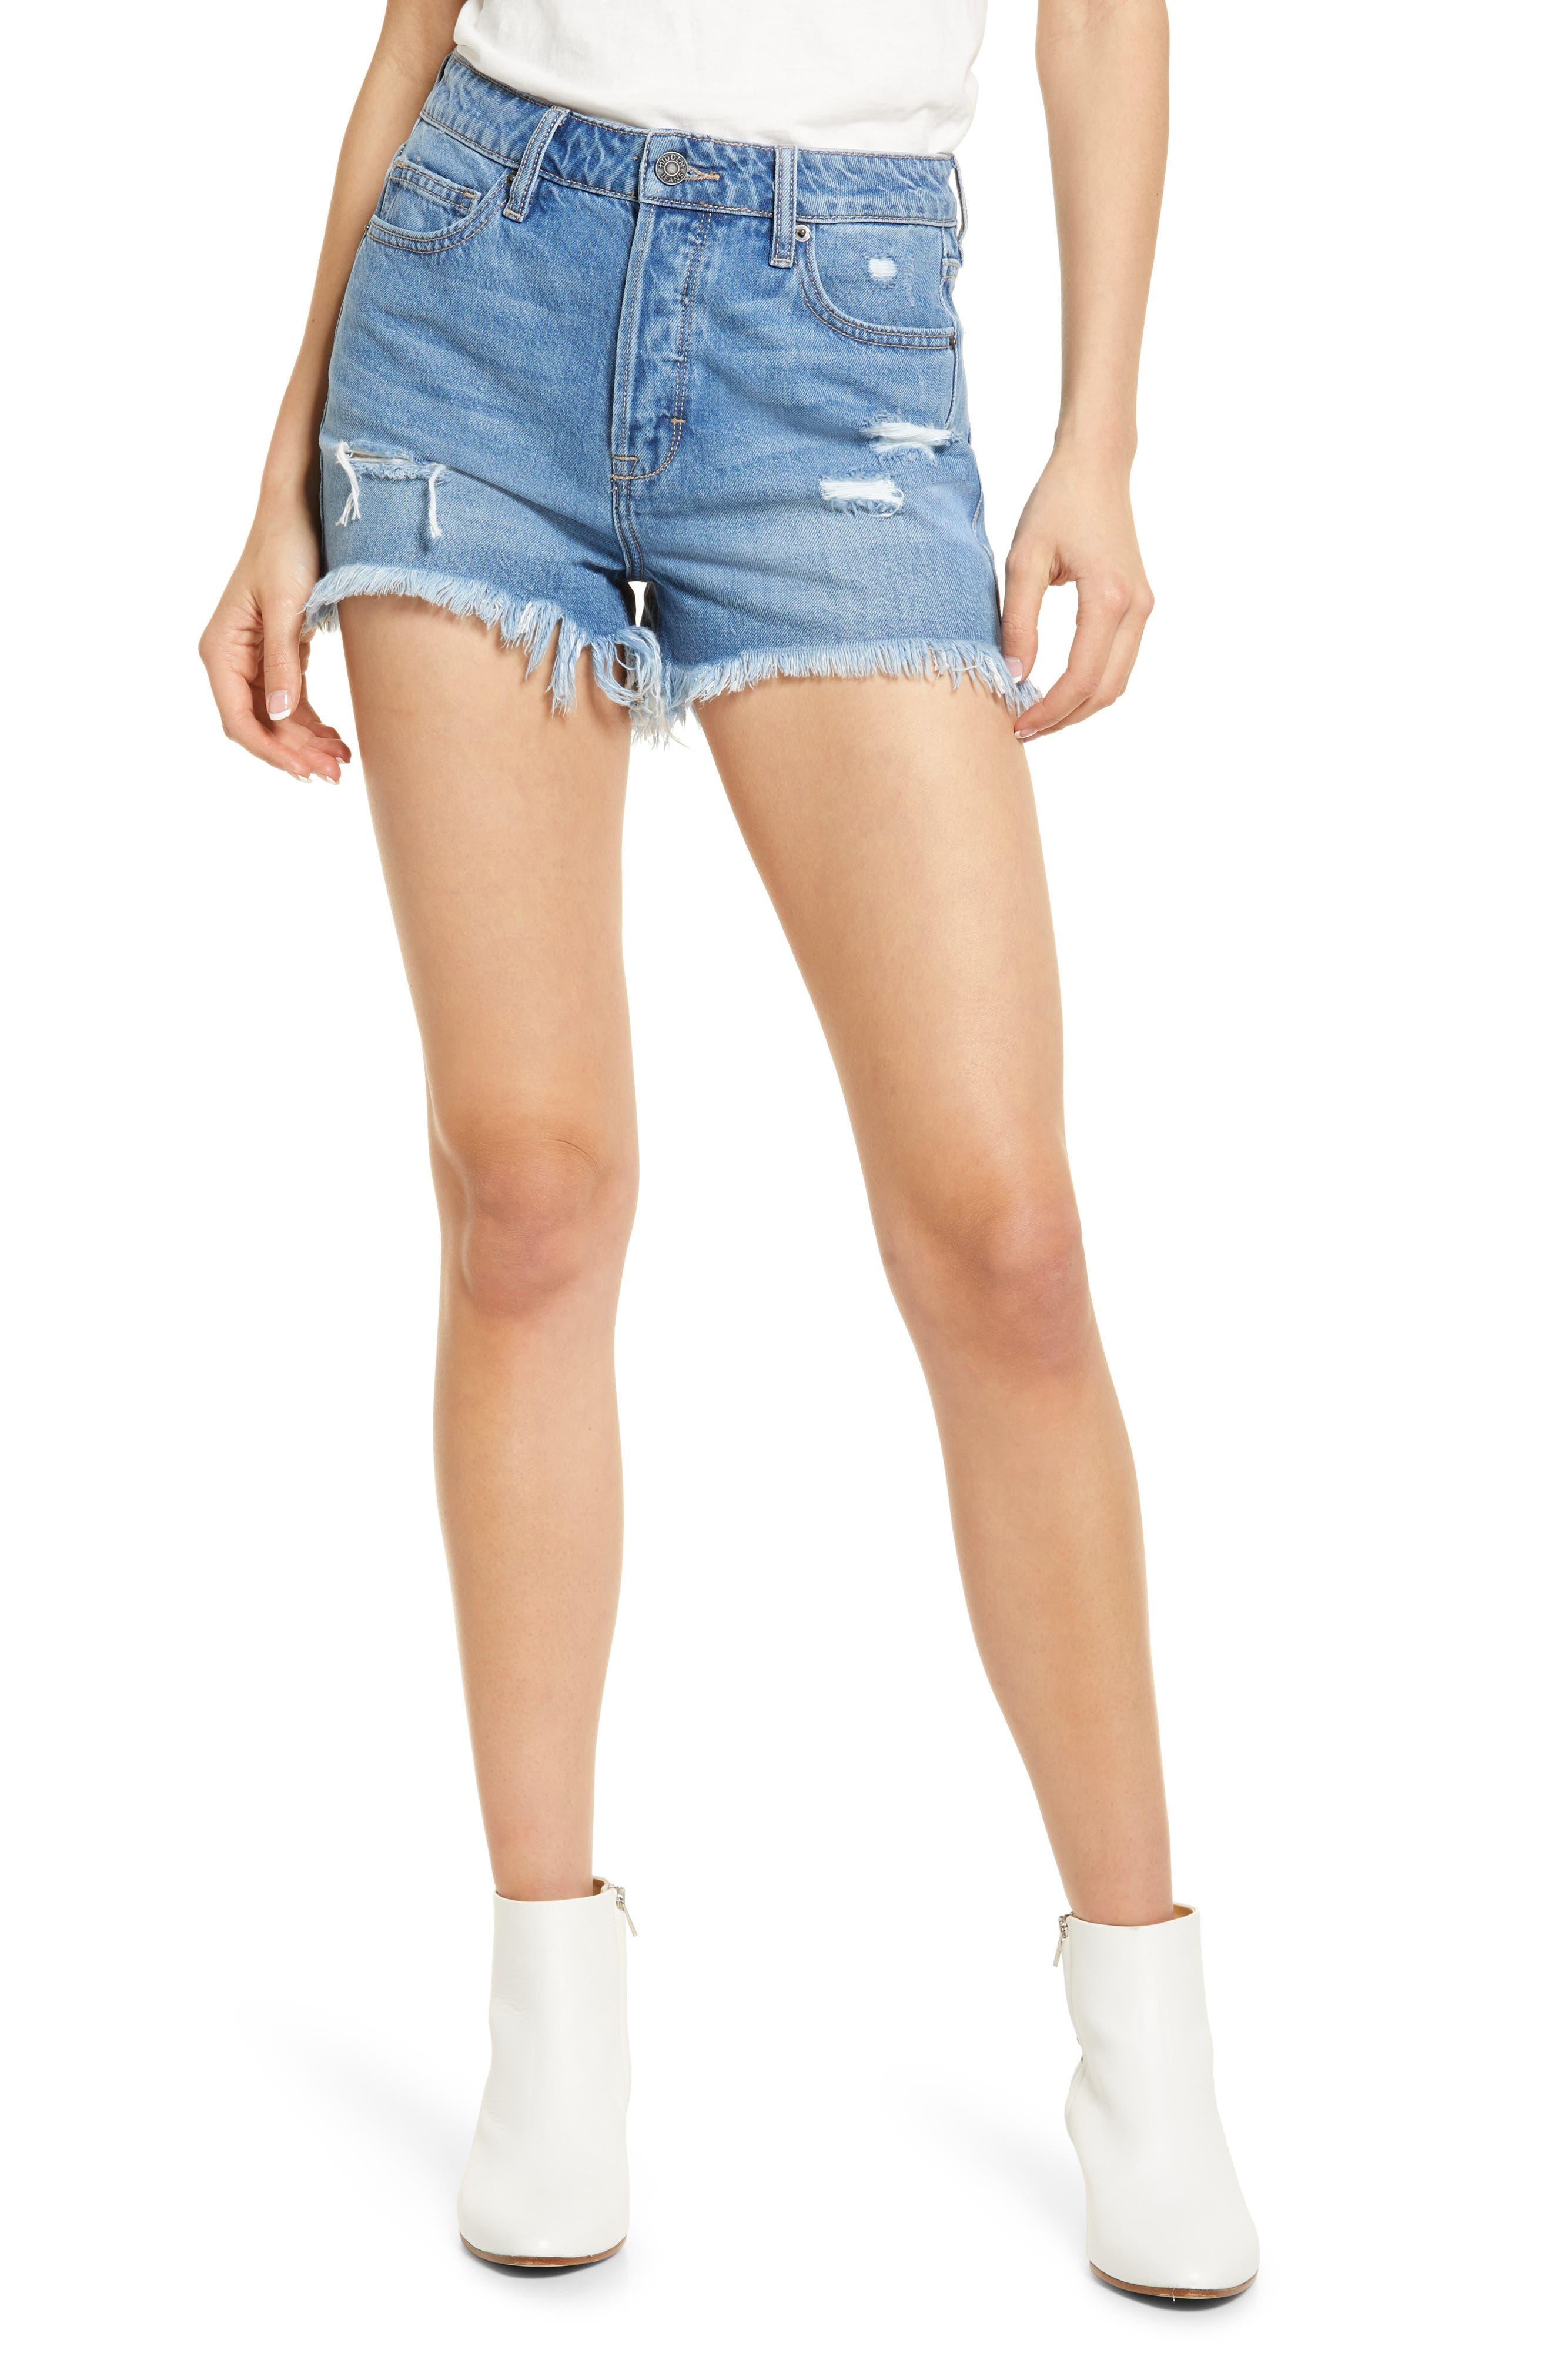 Grinded High Waist Denim Mom Shorts